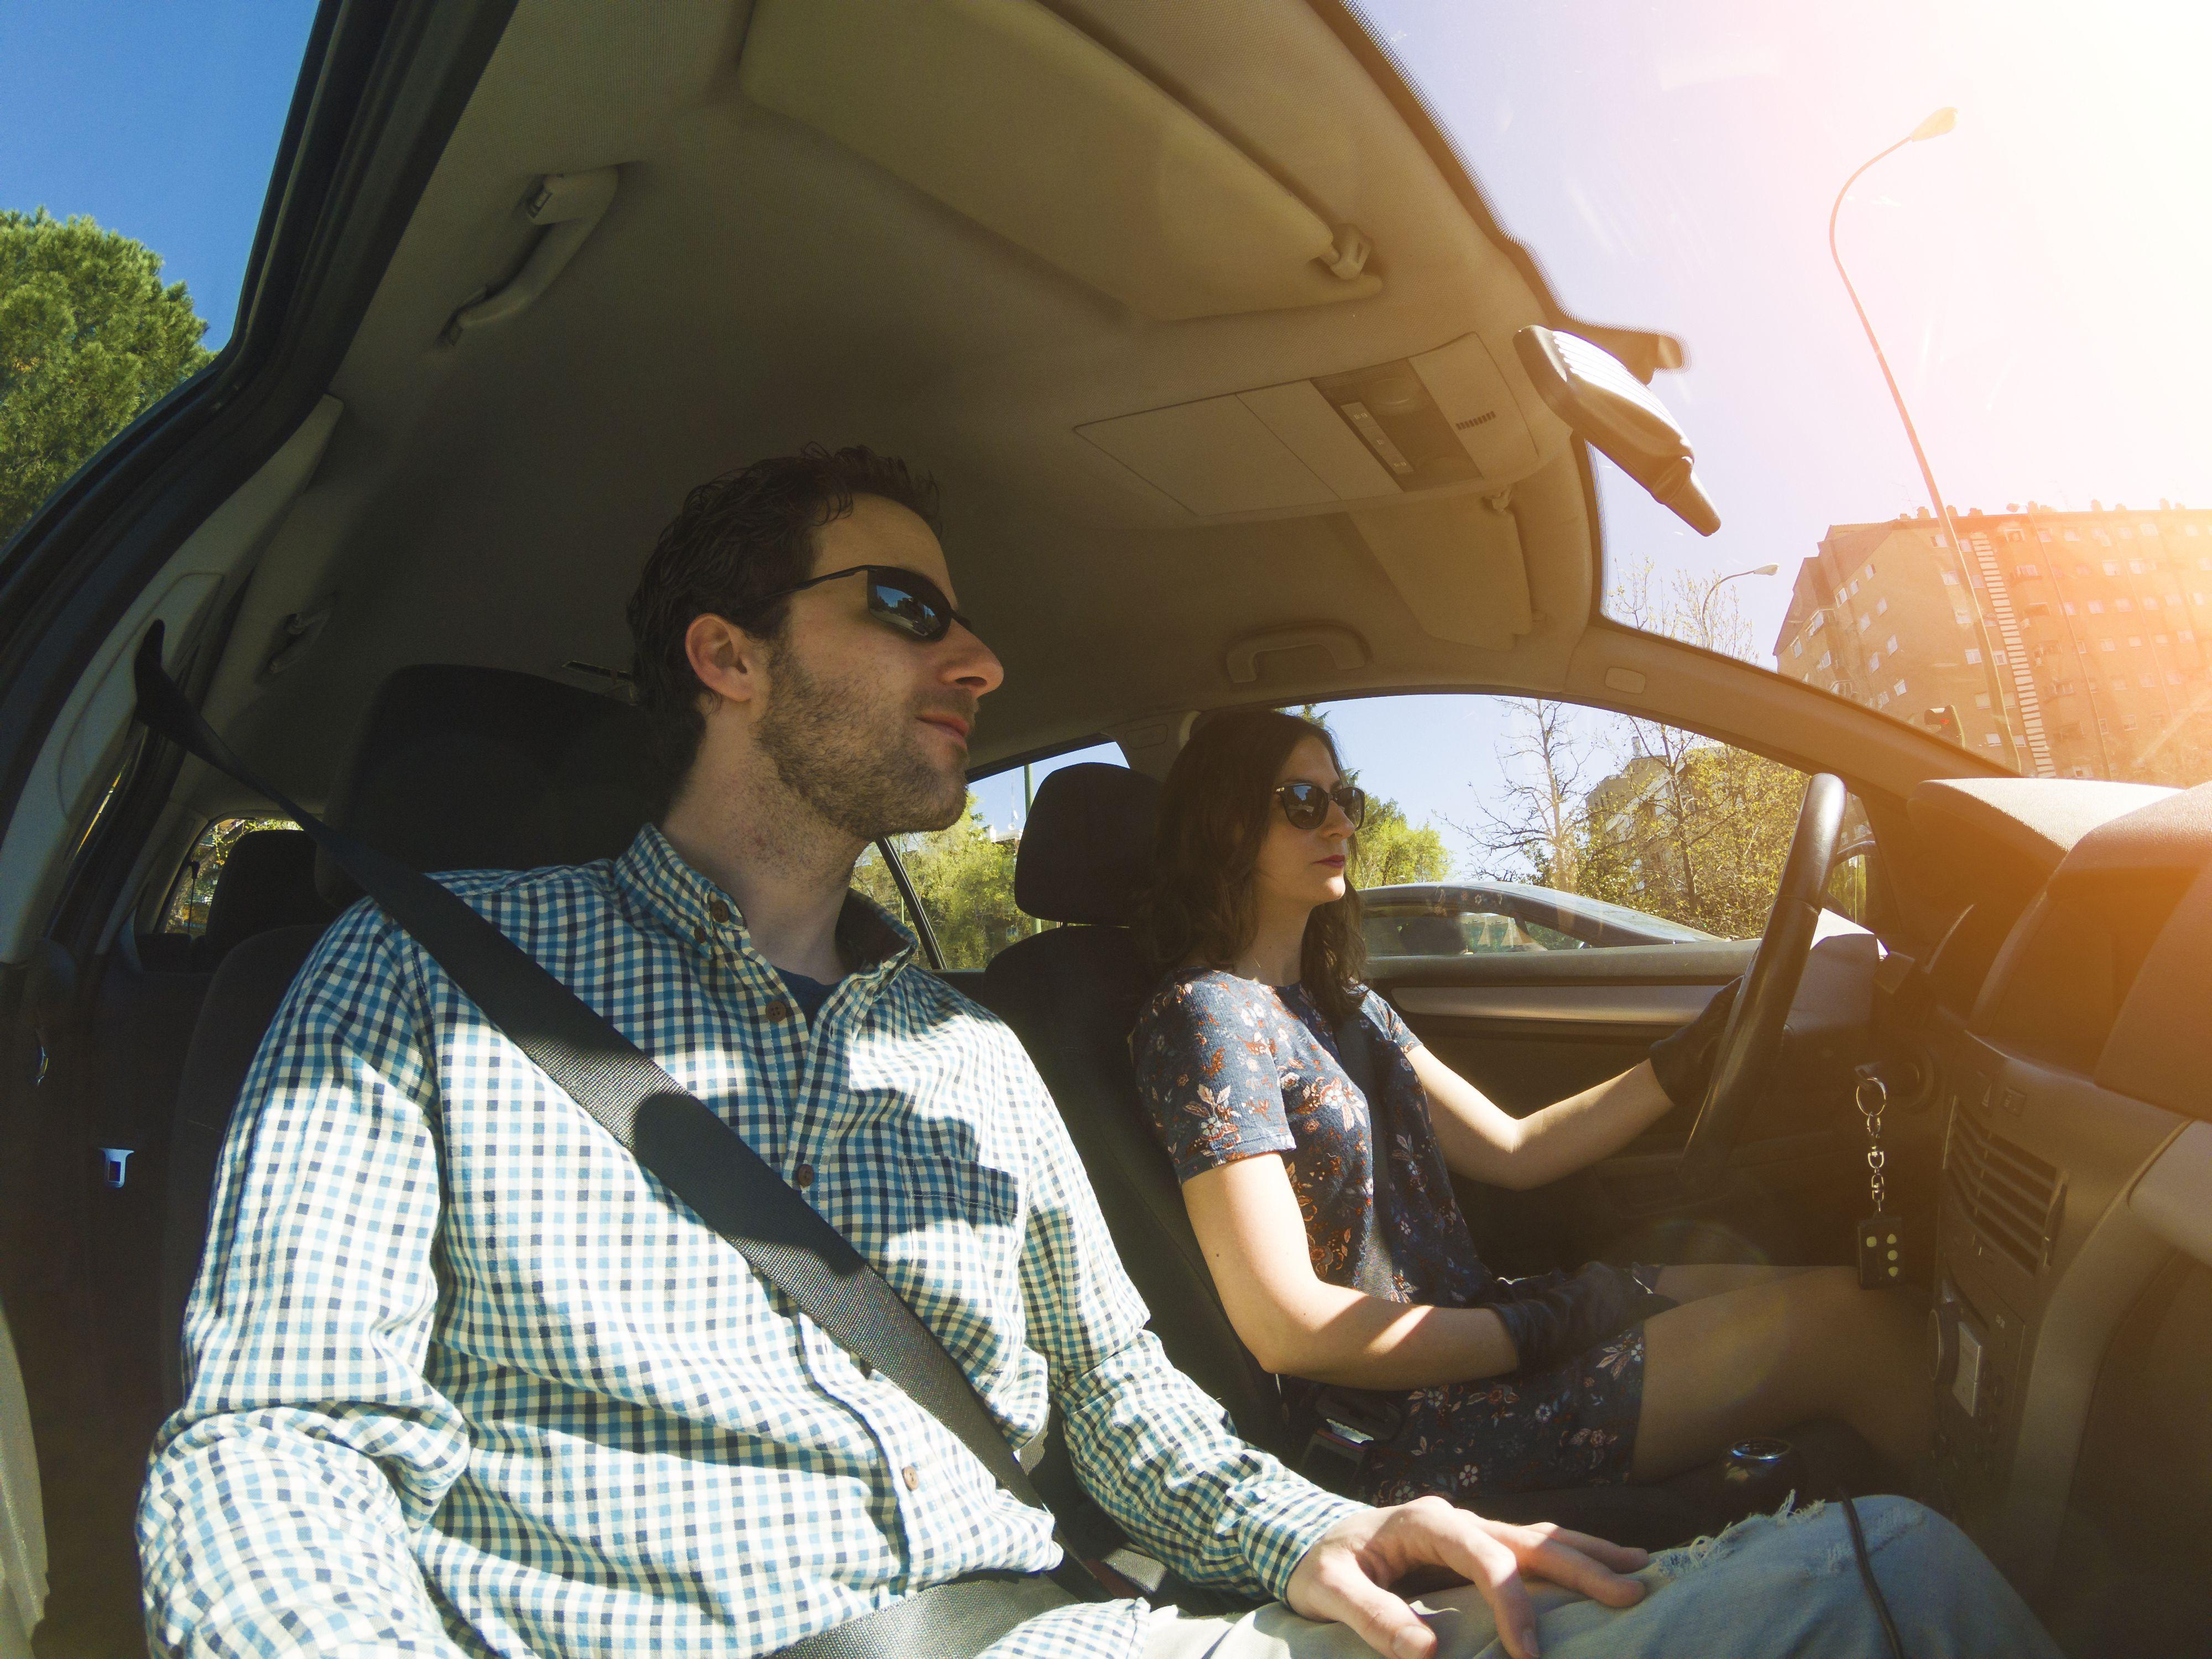 Rent A Car For A Road Trip Cost